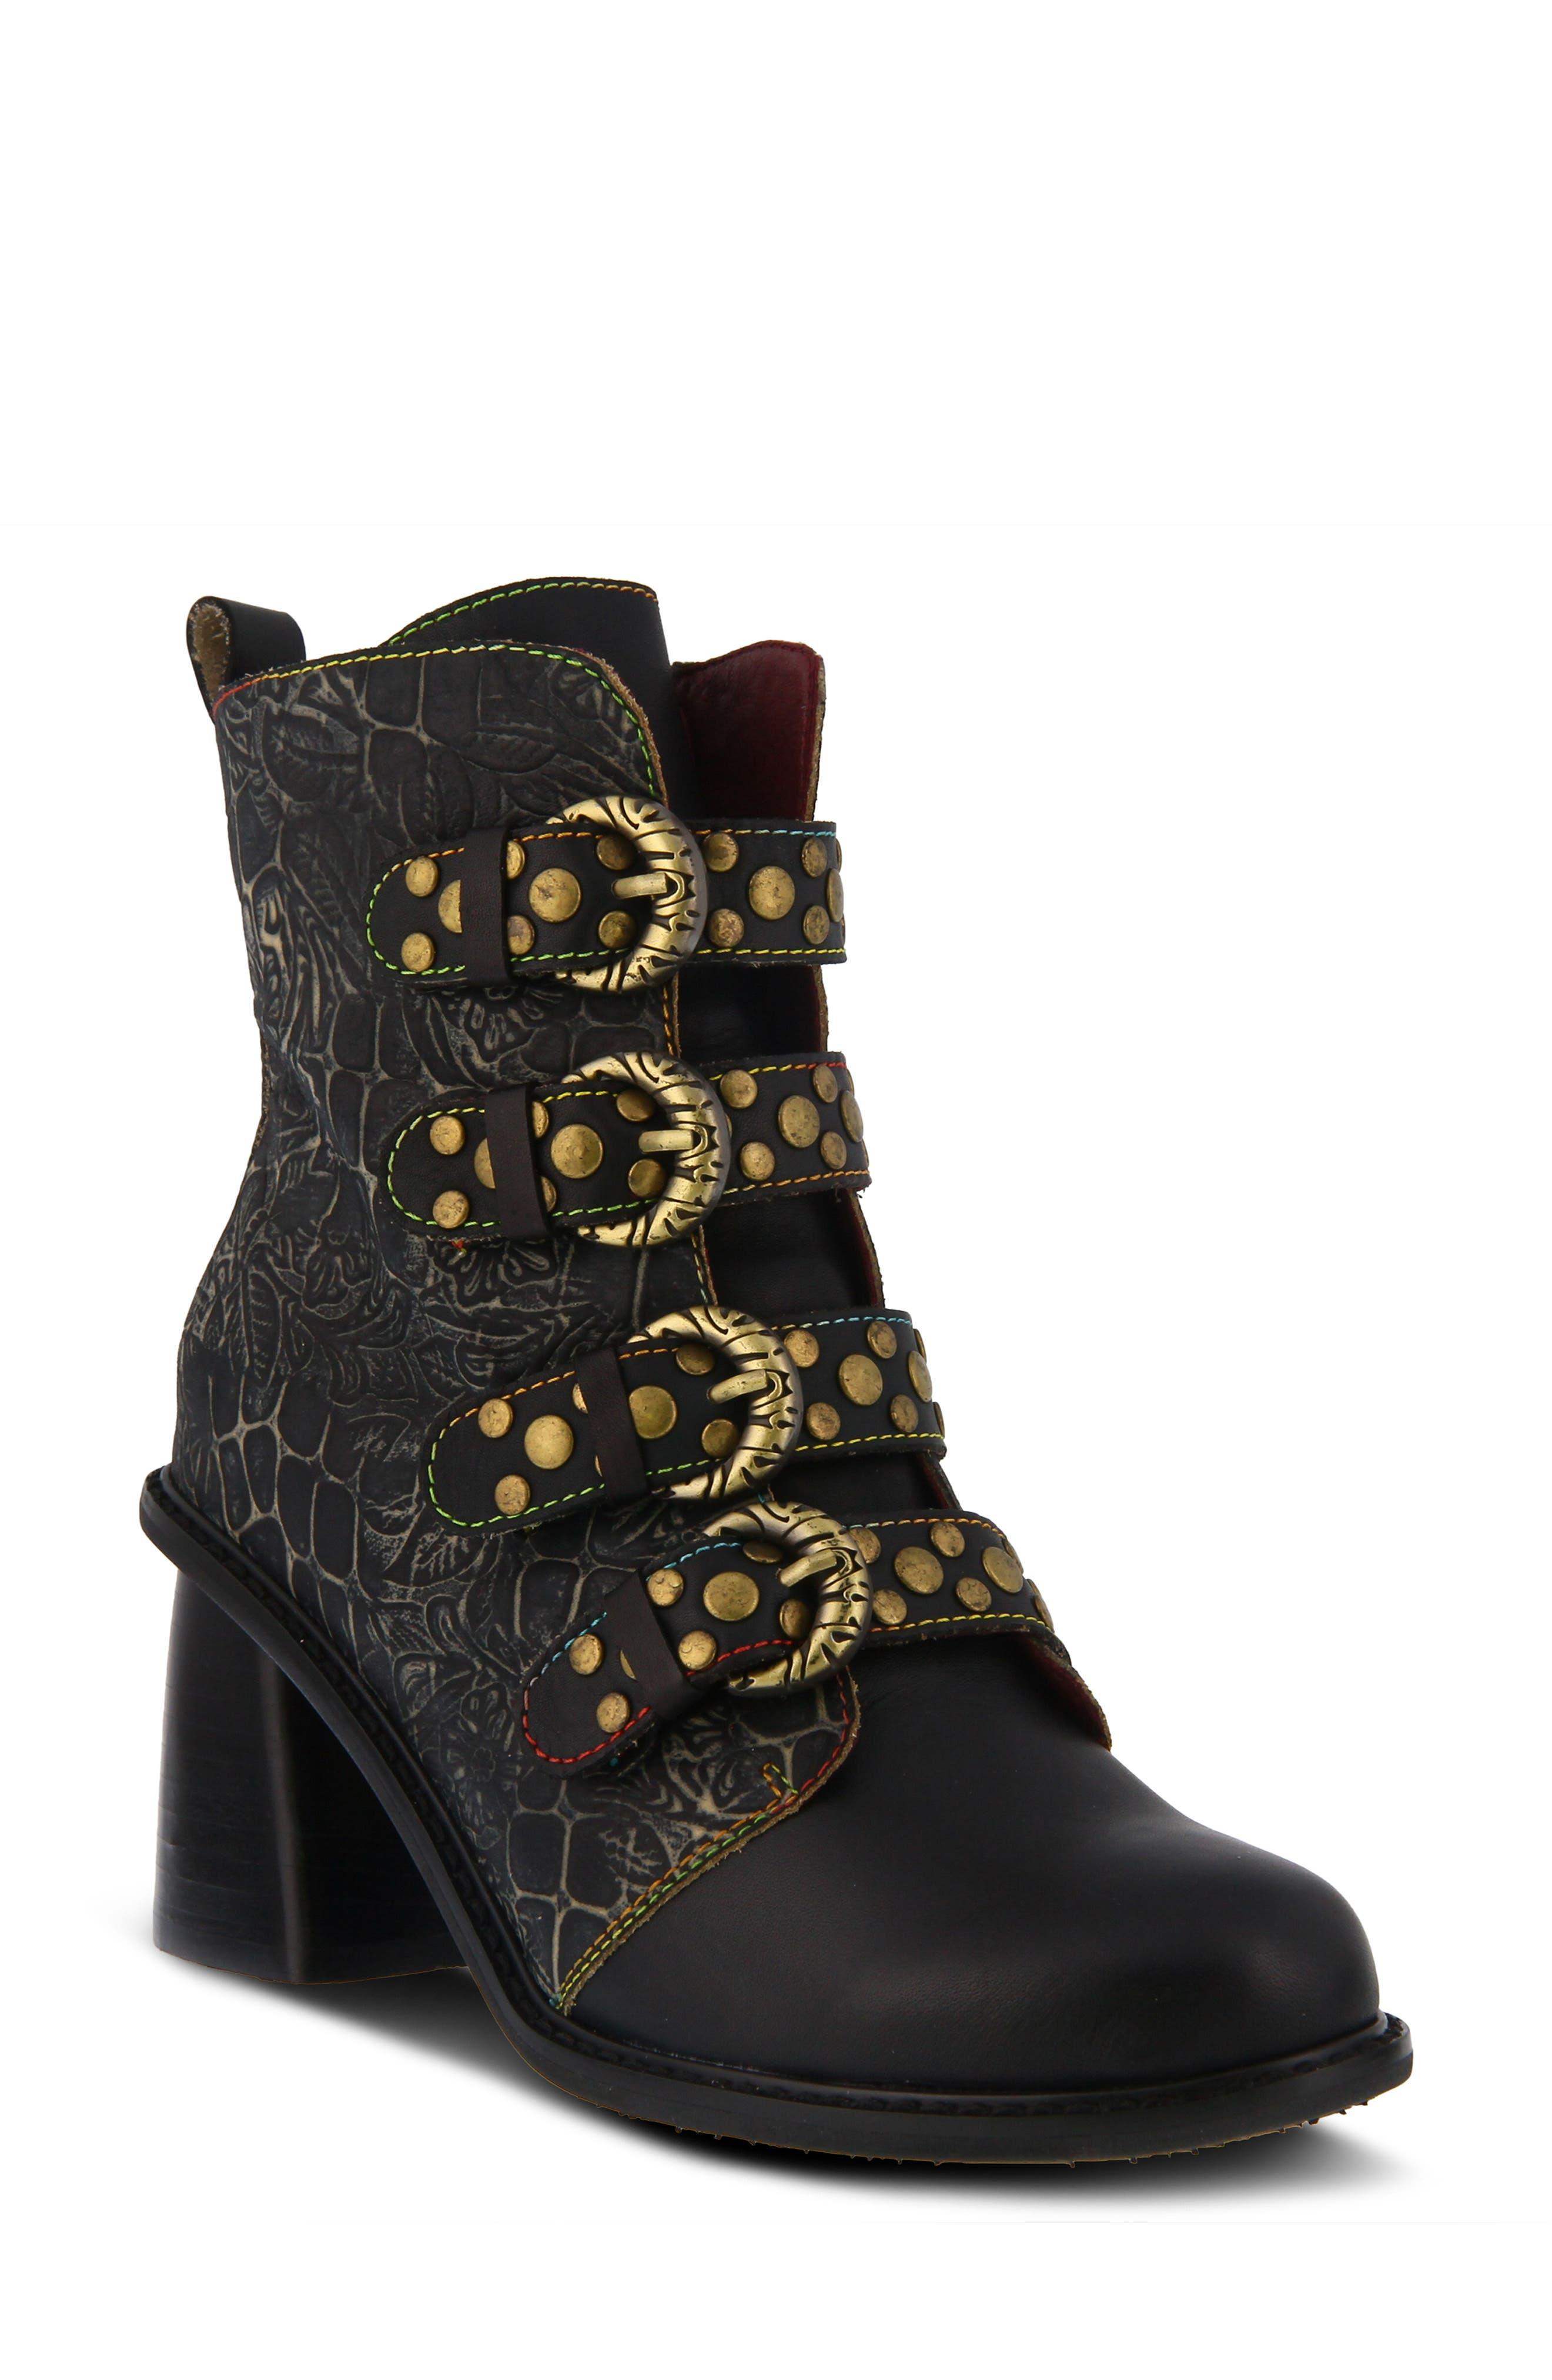 Retro Shoes – Women's Heels, Flats & Sneakers Womens LArtiste Wonderland Bootie Size 9US  40EU - Black $159.95 AT vintagedancer.com